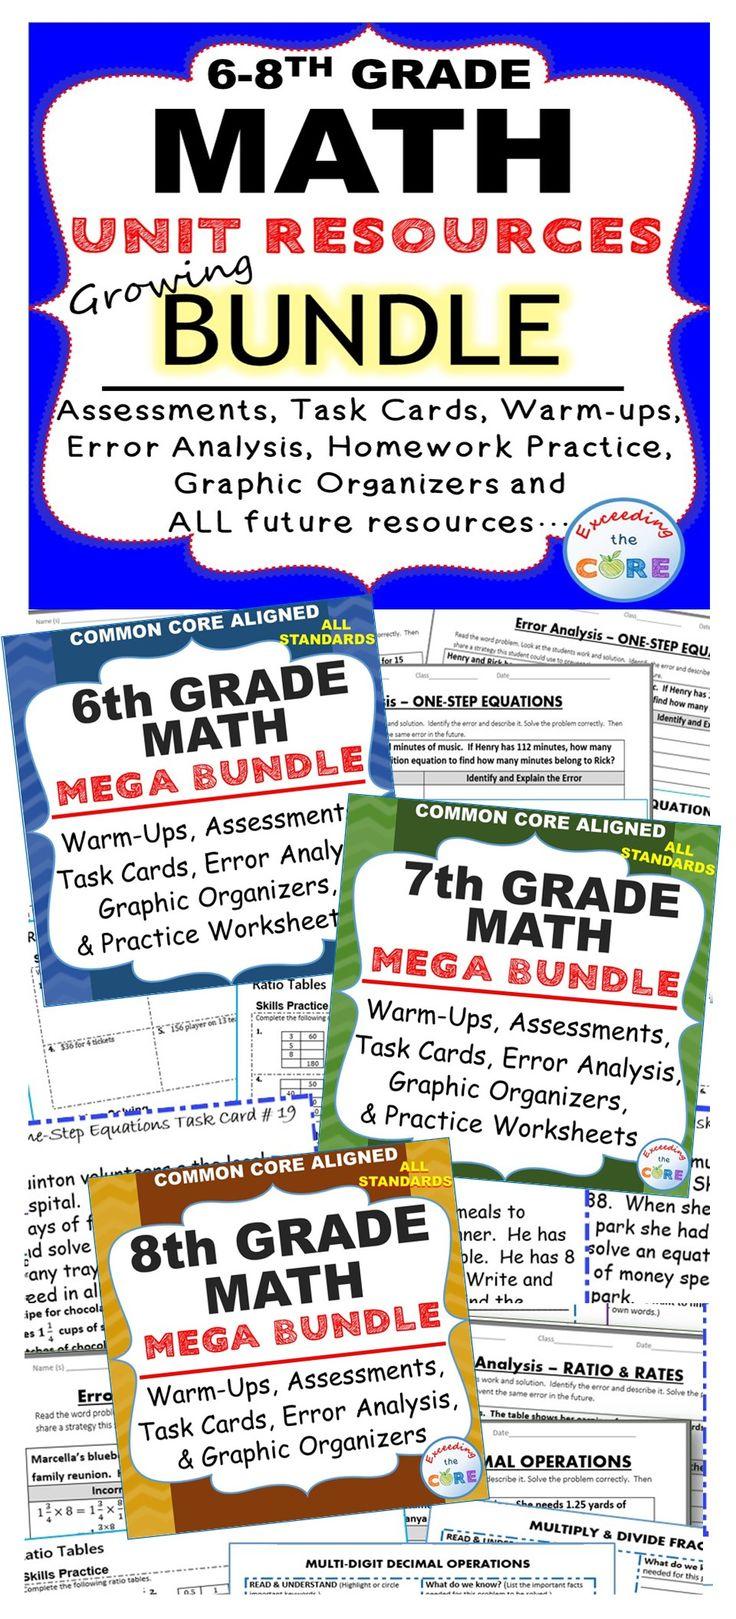 28695 best middle school junior high teaching tools images on pinterest. Black Bedroom Furniture Sets. Home Design Ideas